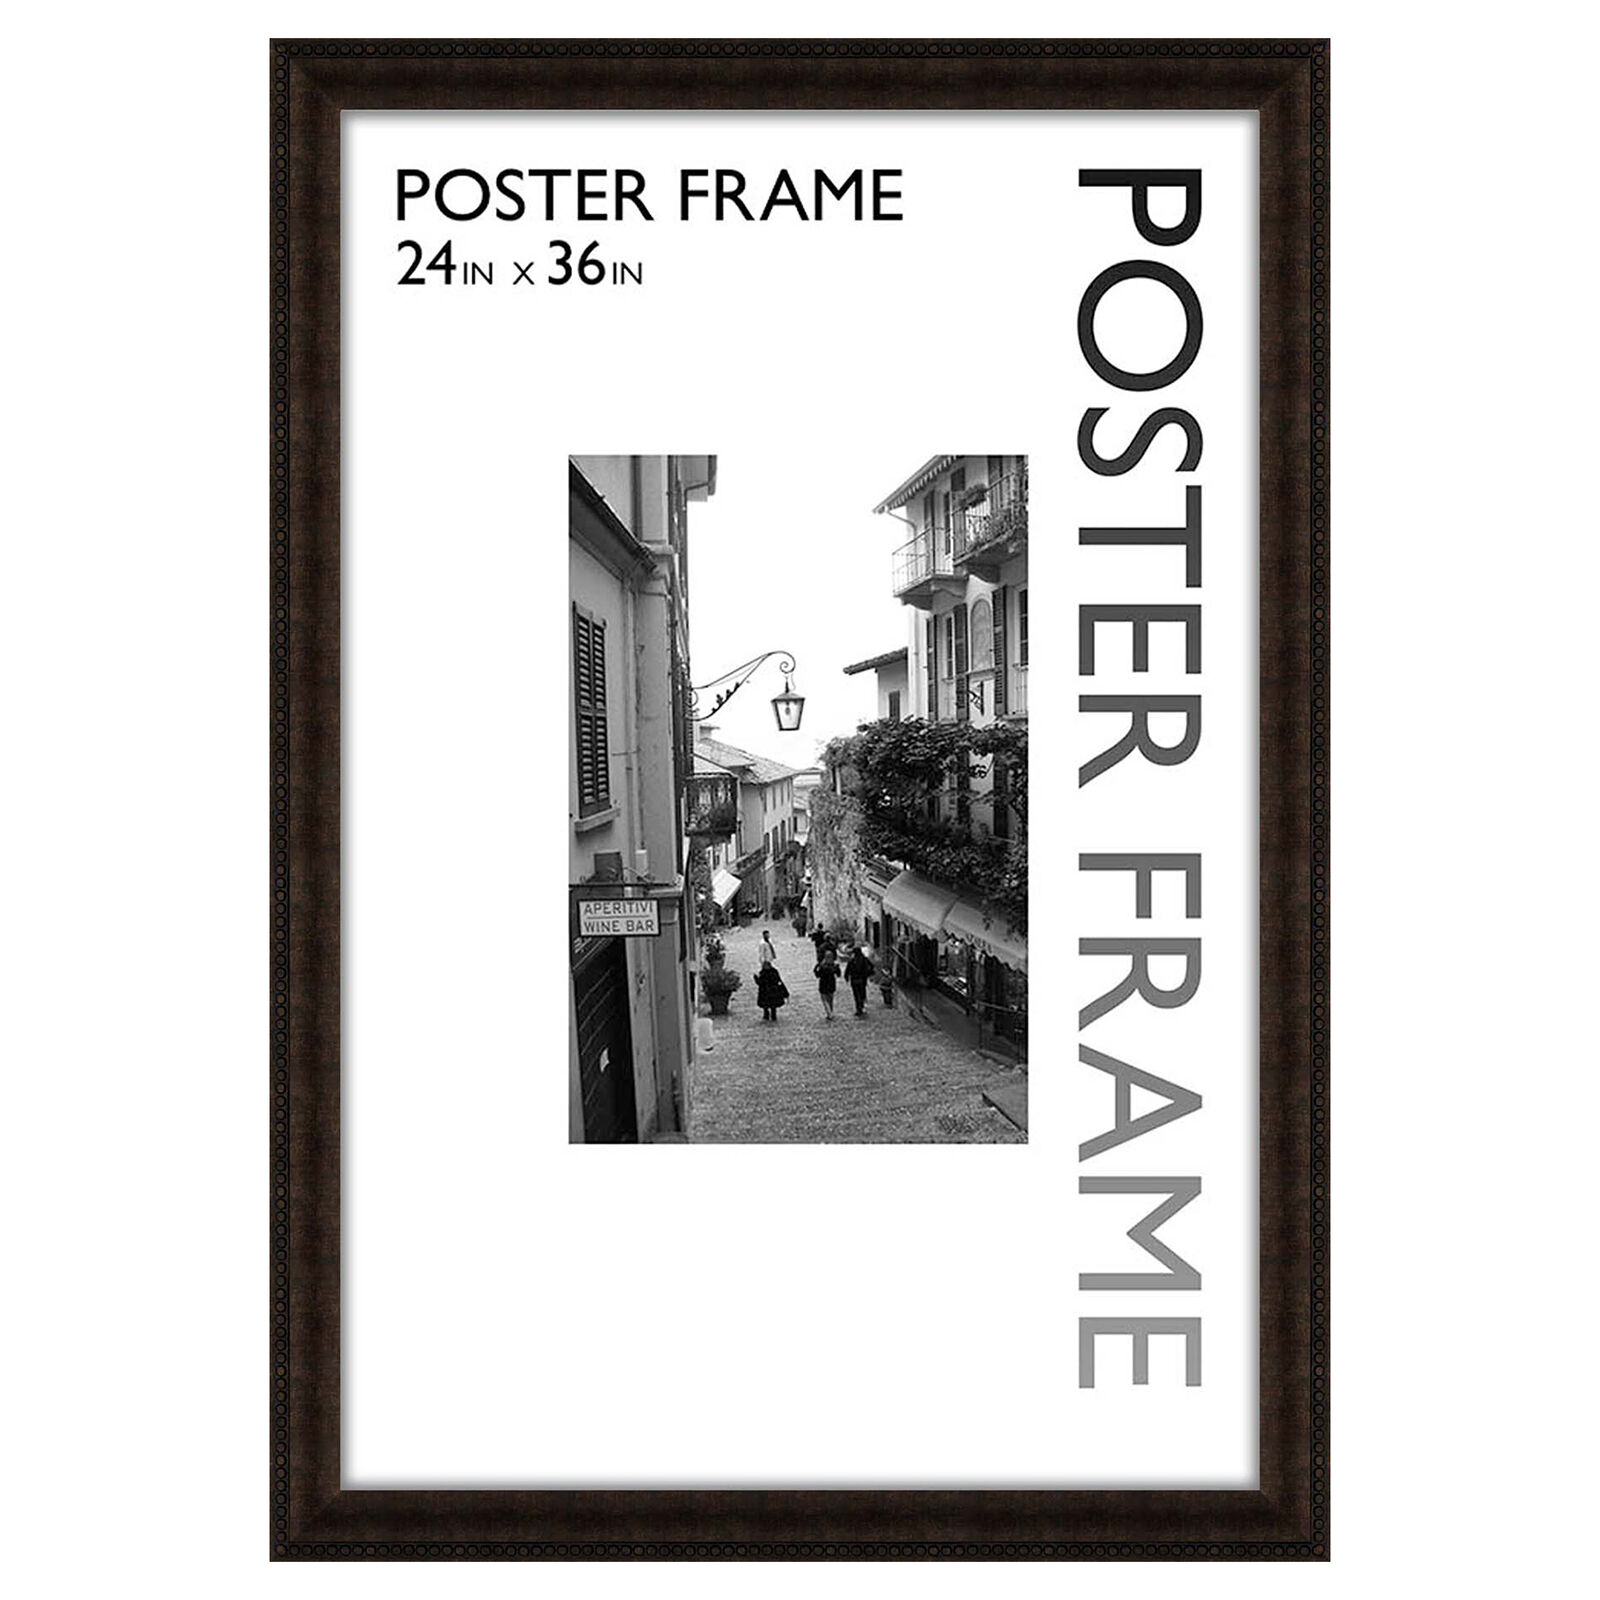 Breathtaking X Beaded Bronze Poster Frame X Beaded Bronze Poster Frame At Home 24x36 Frame Walmart 24 X 36 Frameless Wall Mirror photos 24 X 36 Frame